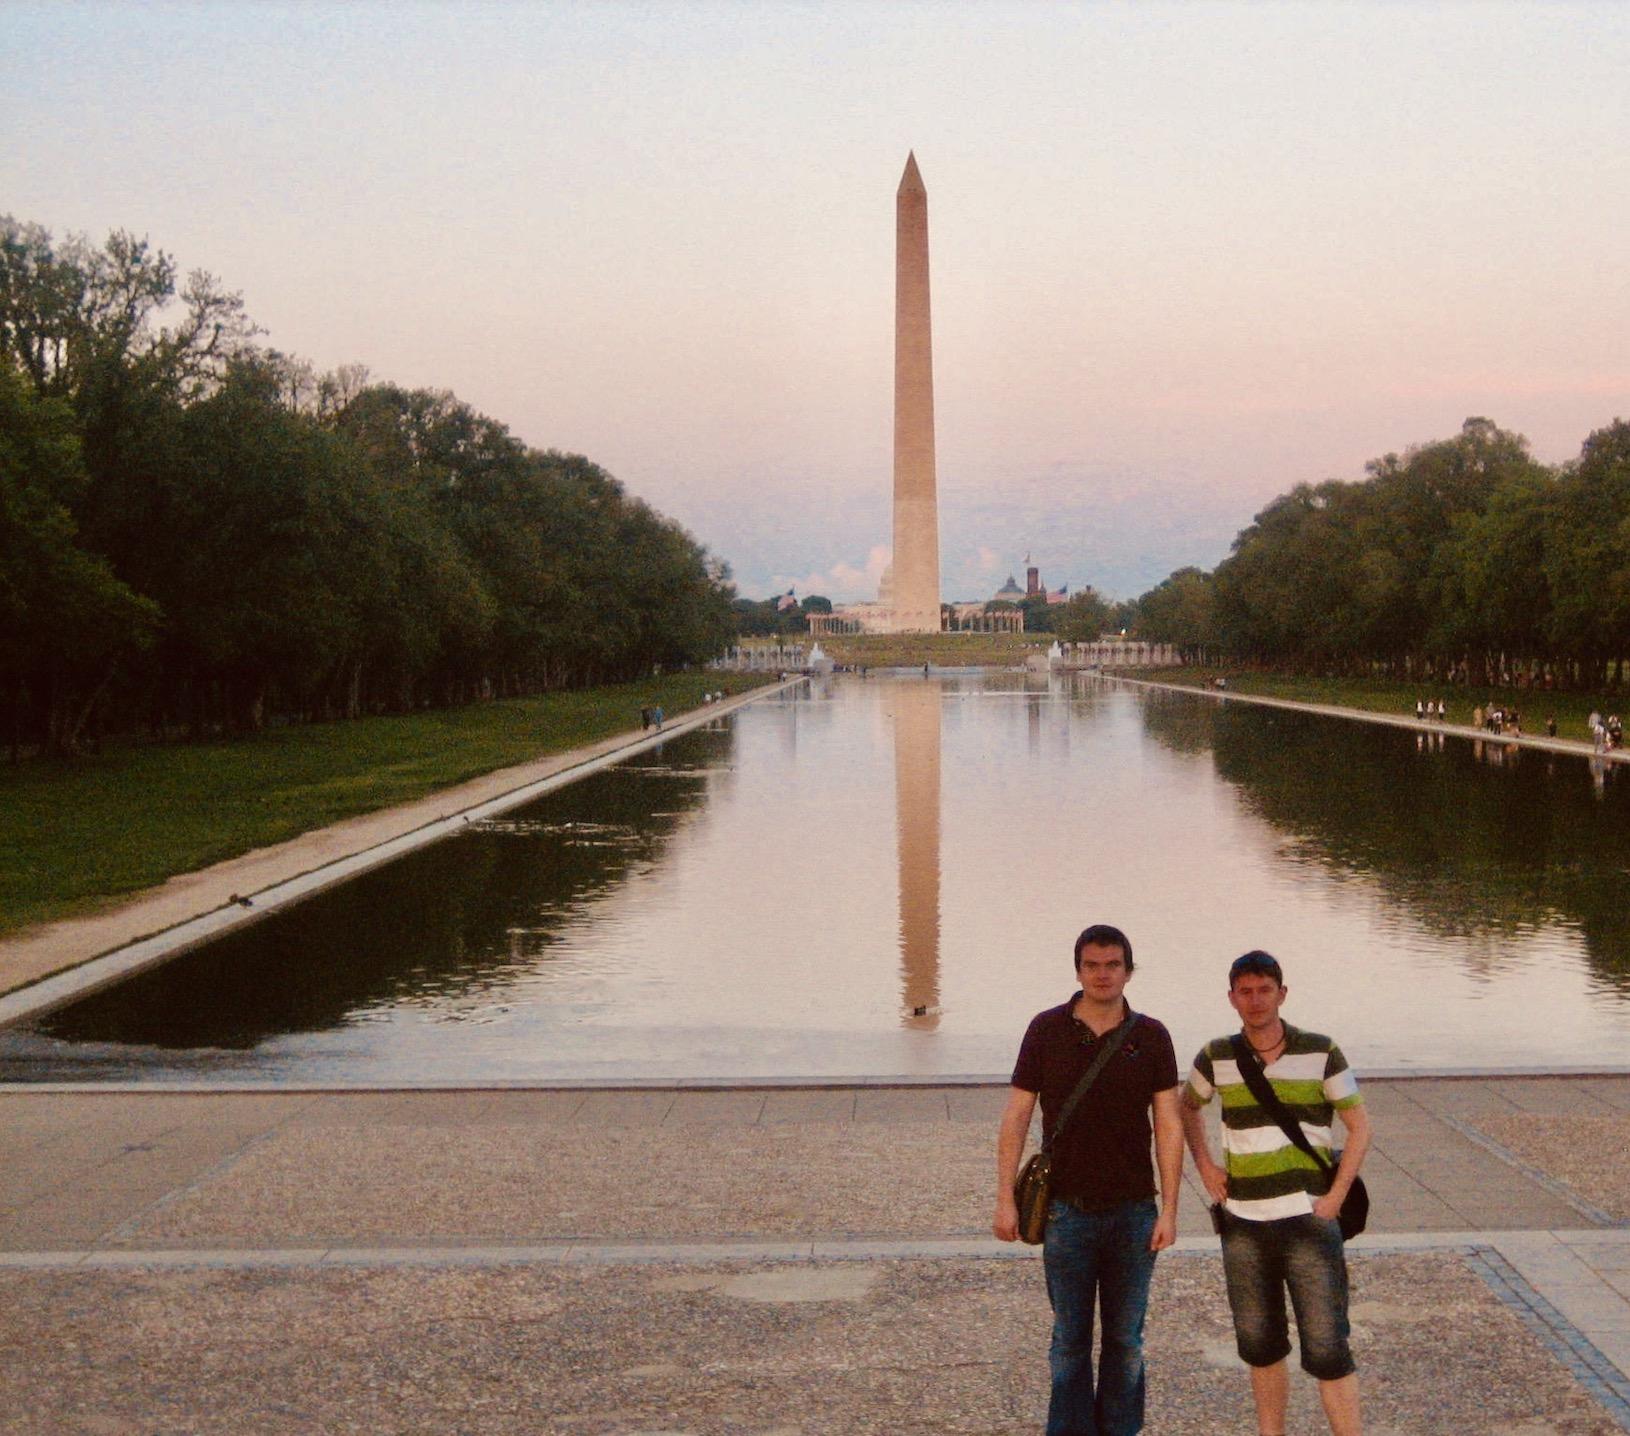 Lincoln Memorial Reflecting Pool.